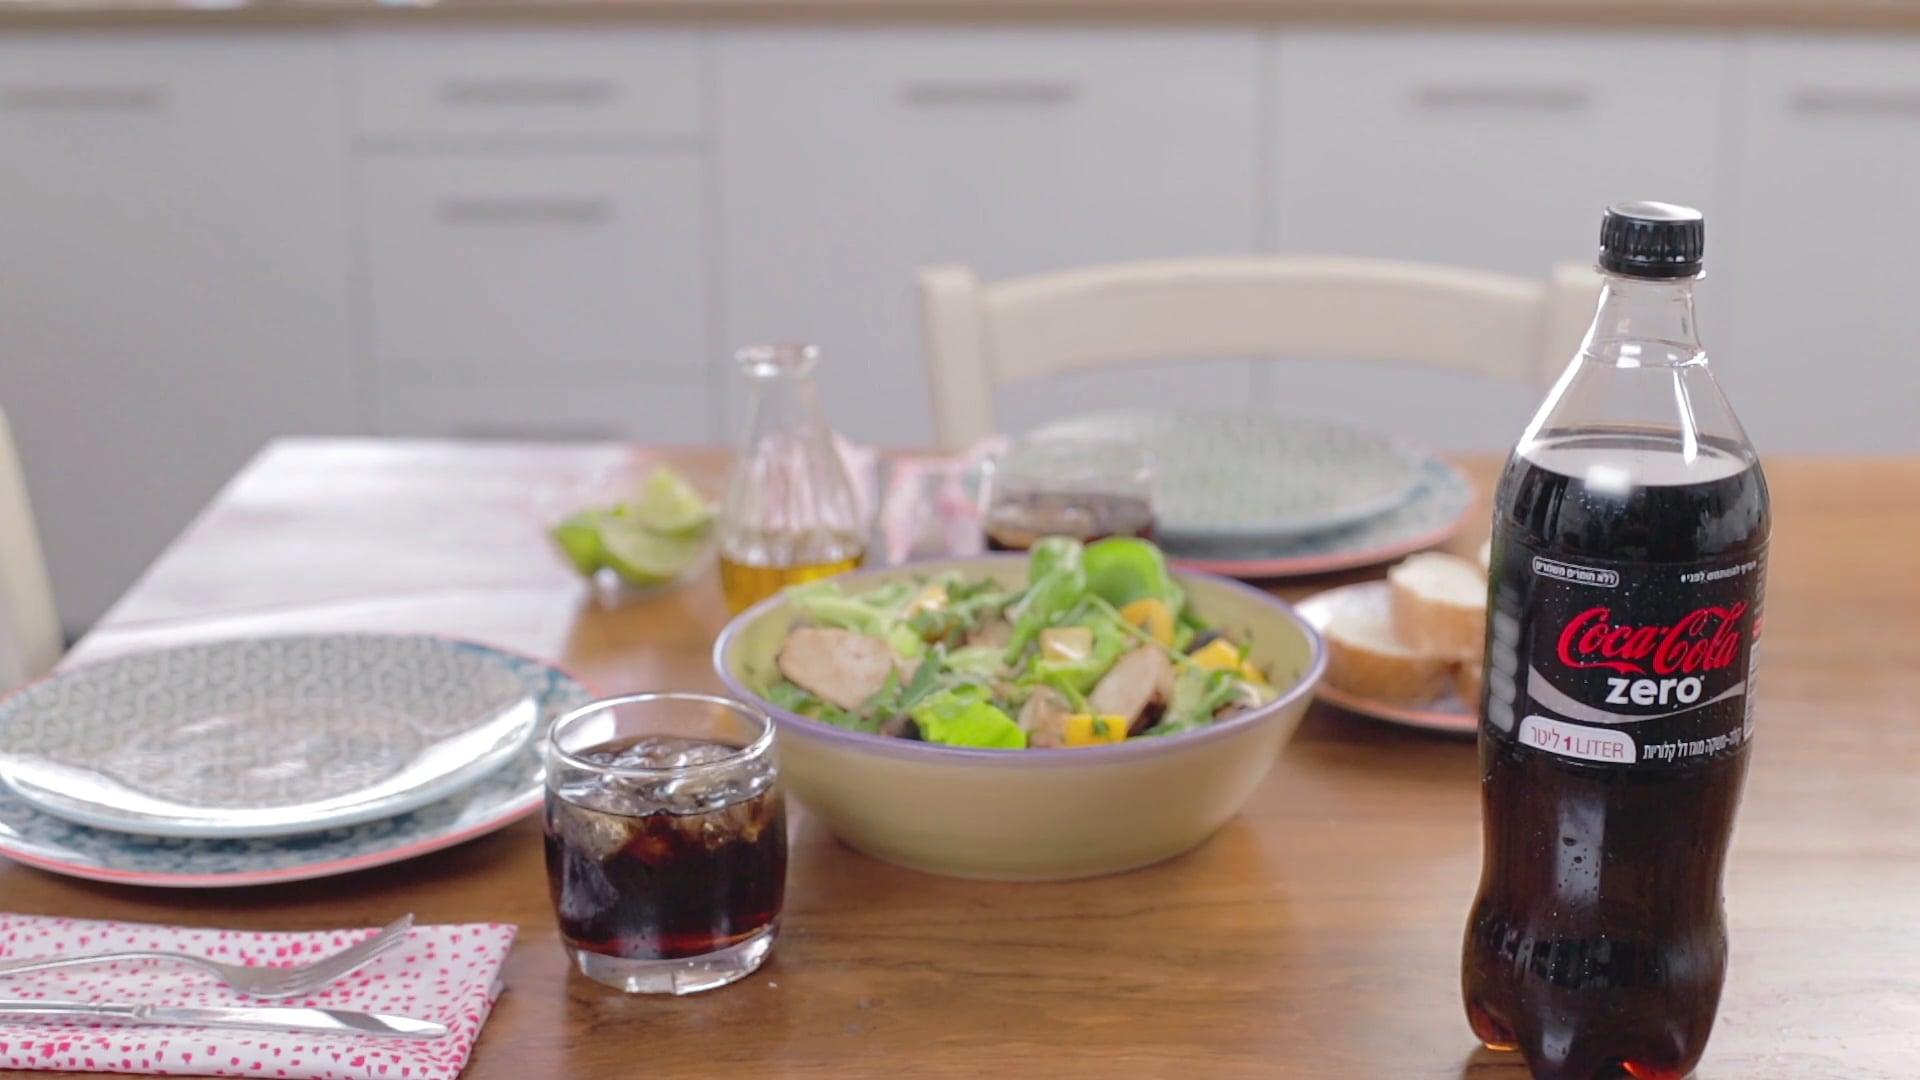 Coke & Meal Salad recipe